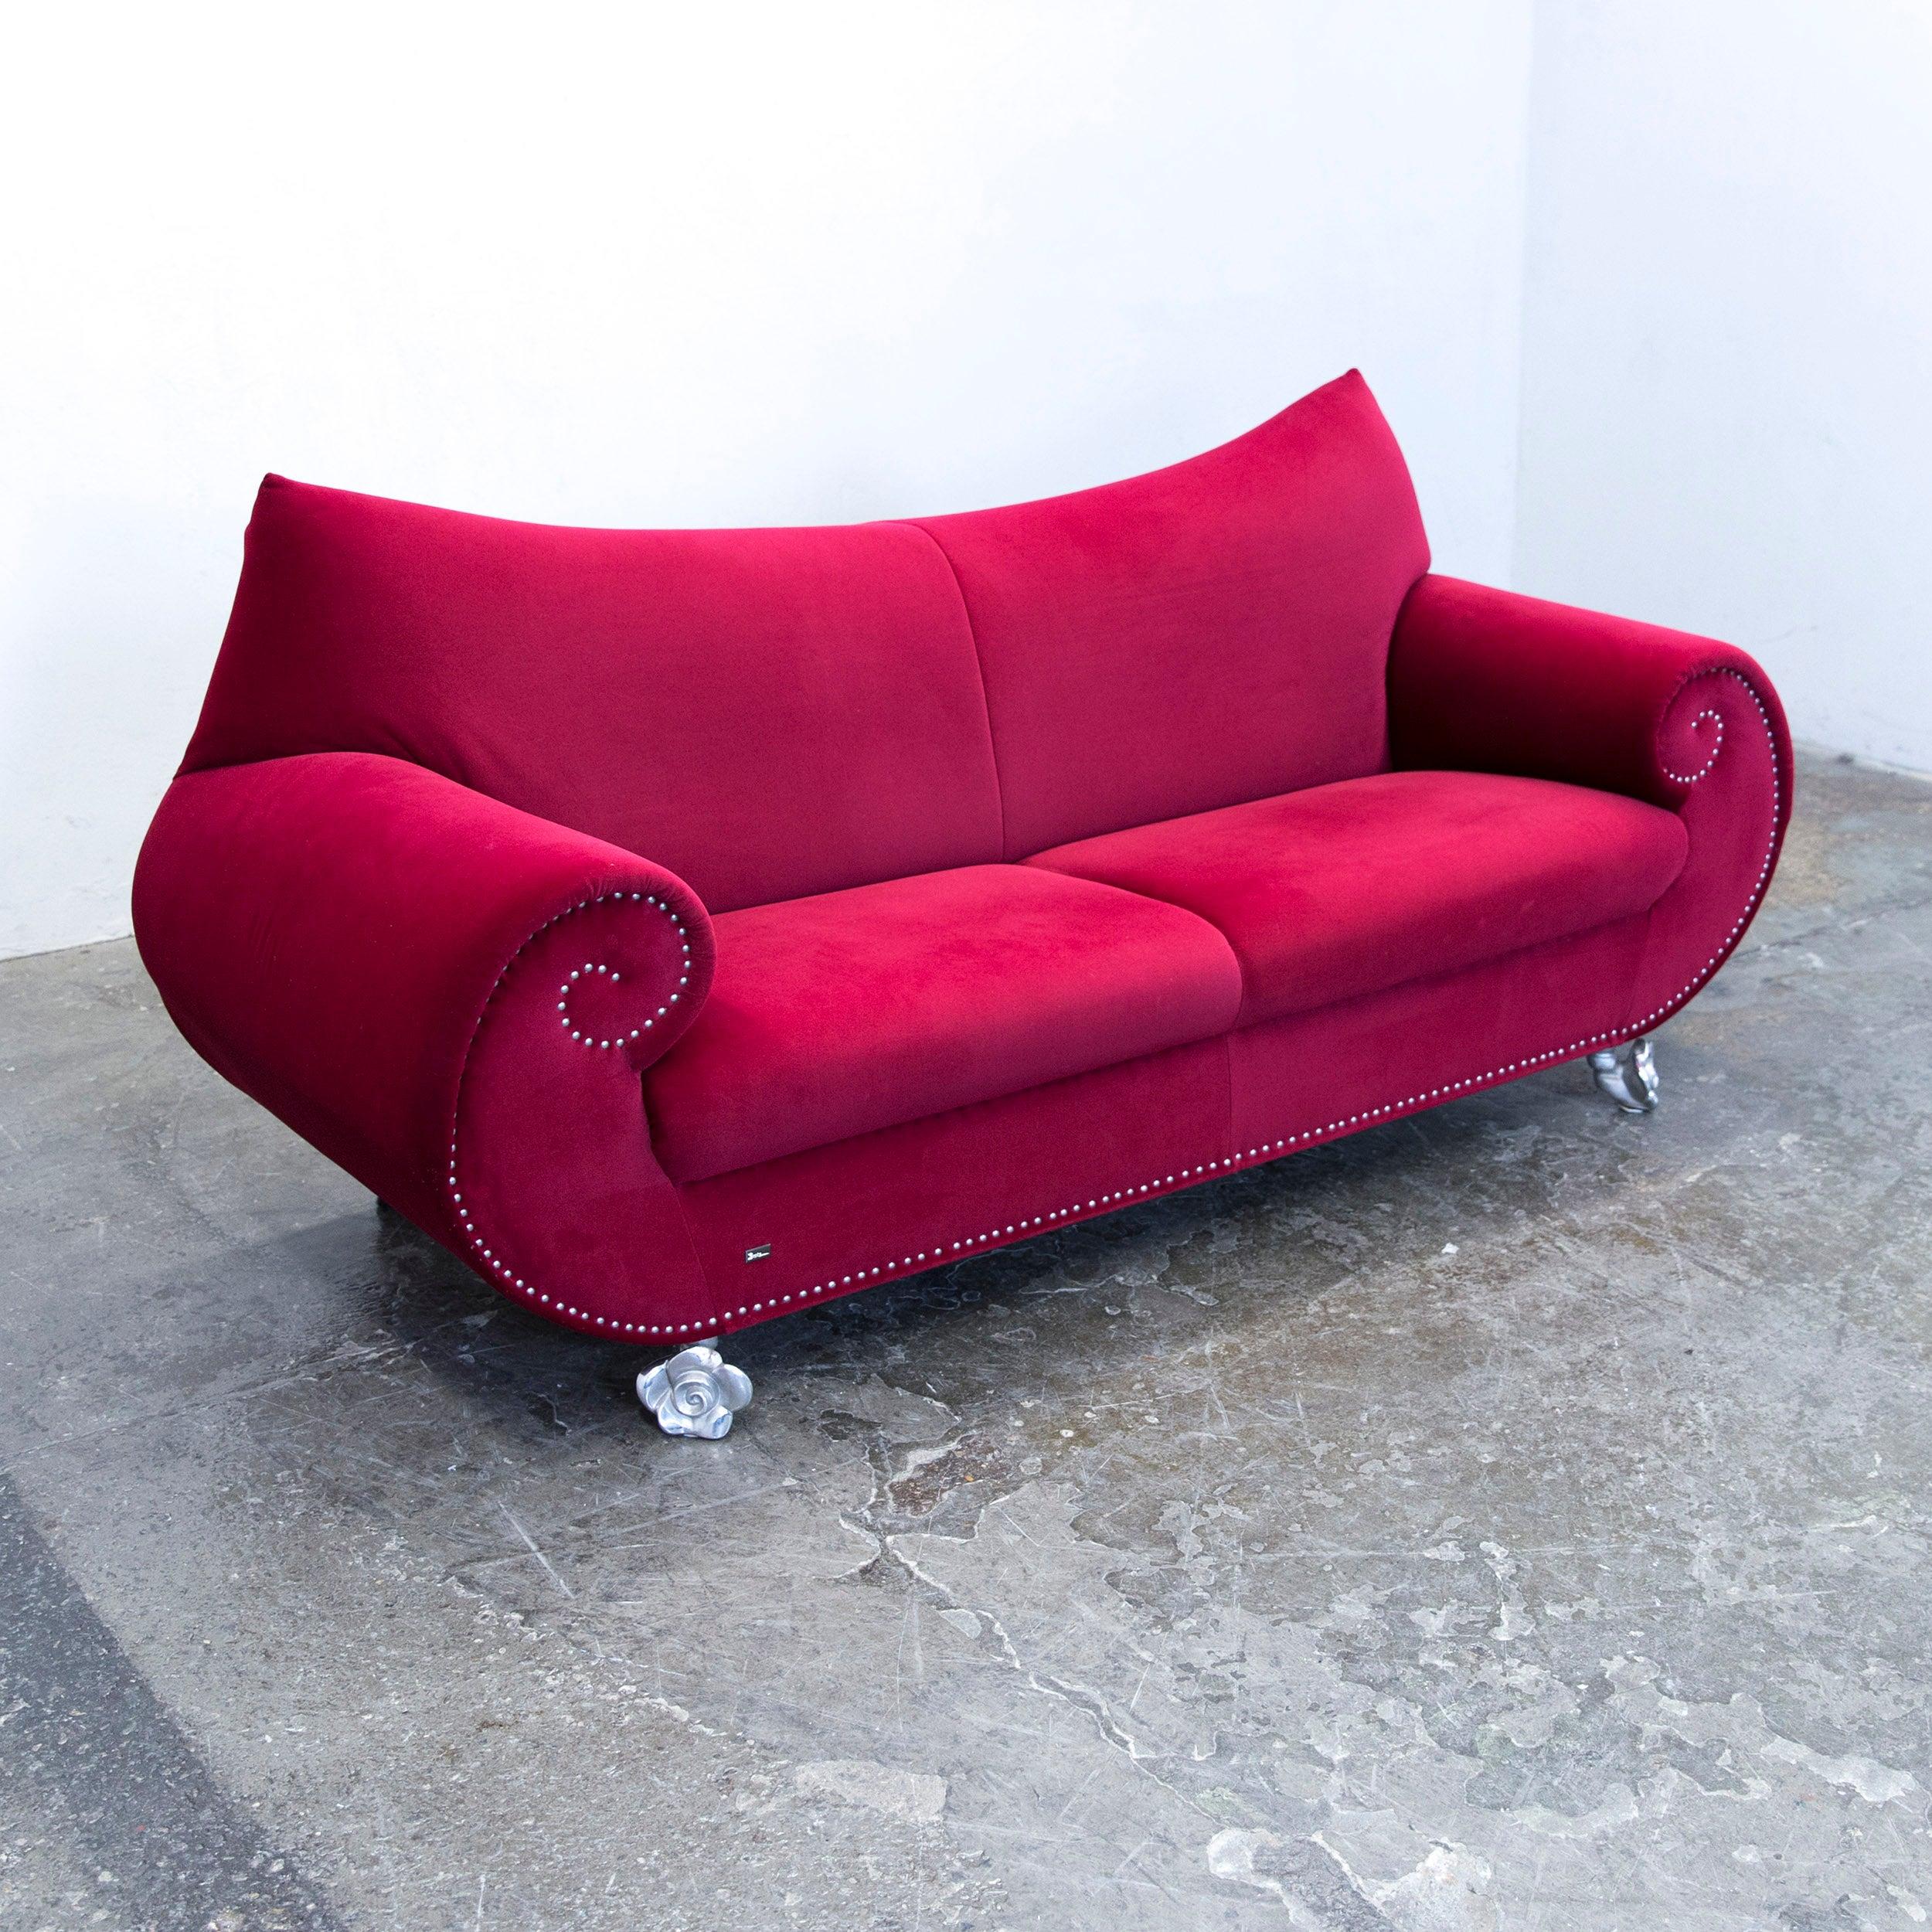 Bretz Gaudi Designer Sofa Fabric Red Violet Three-Seat Couch Modern ...